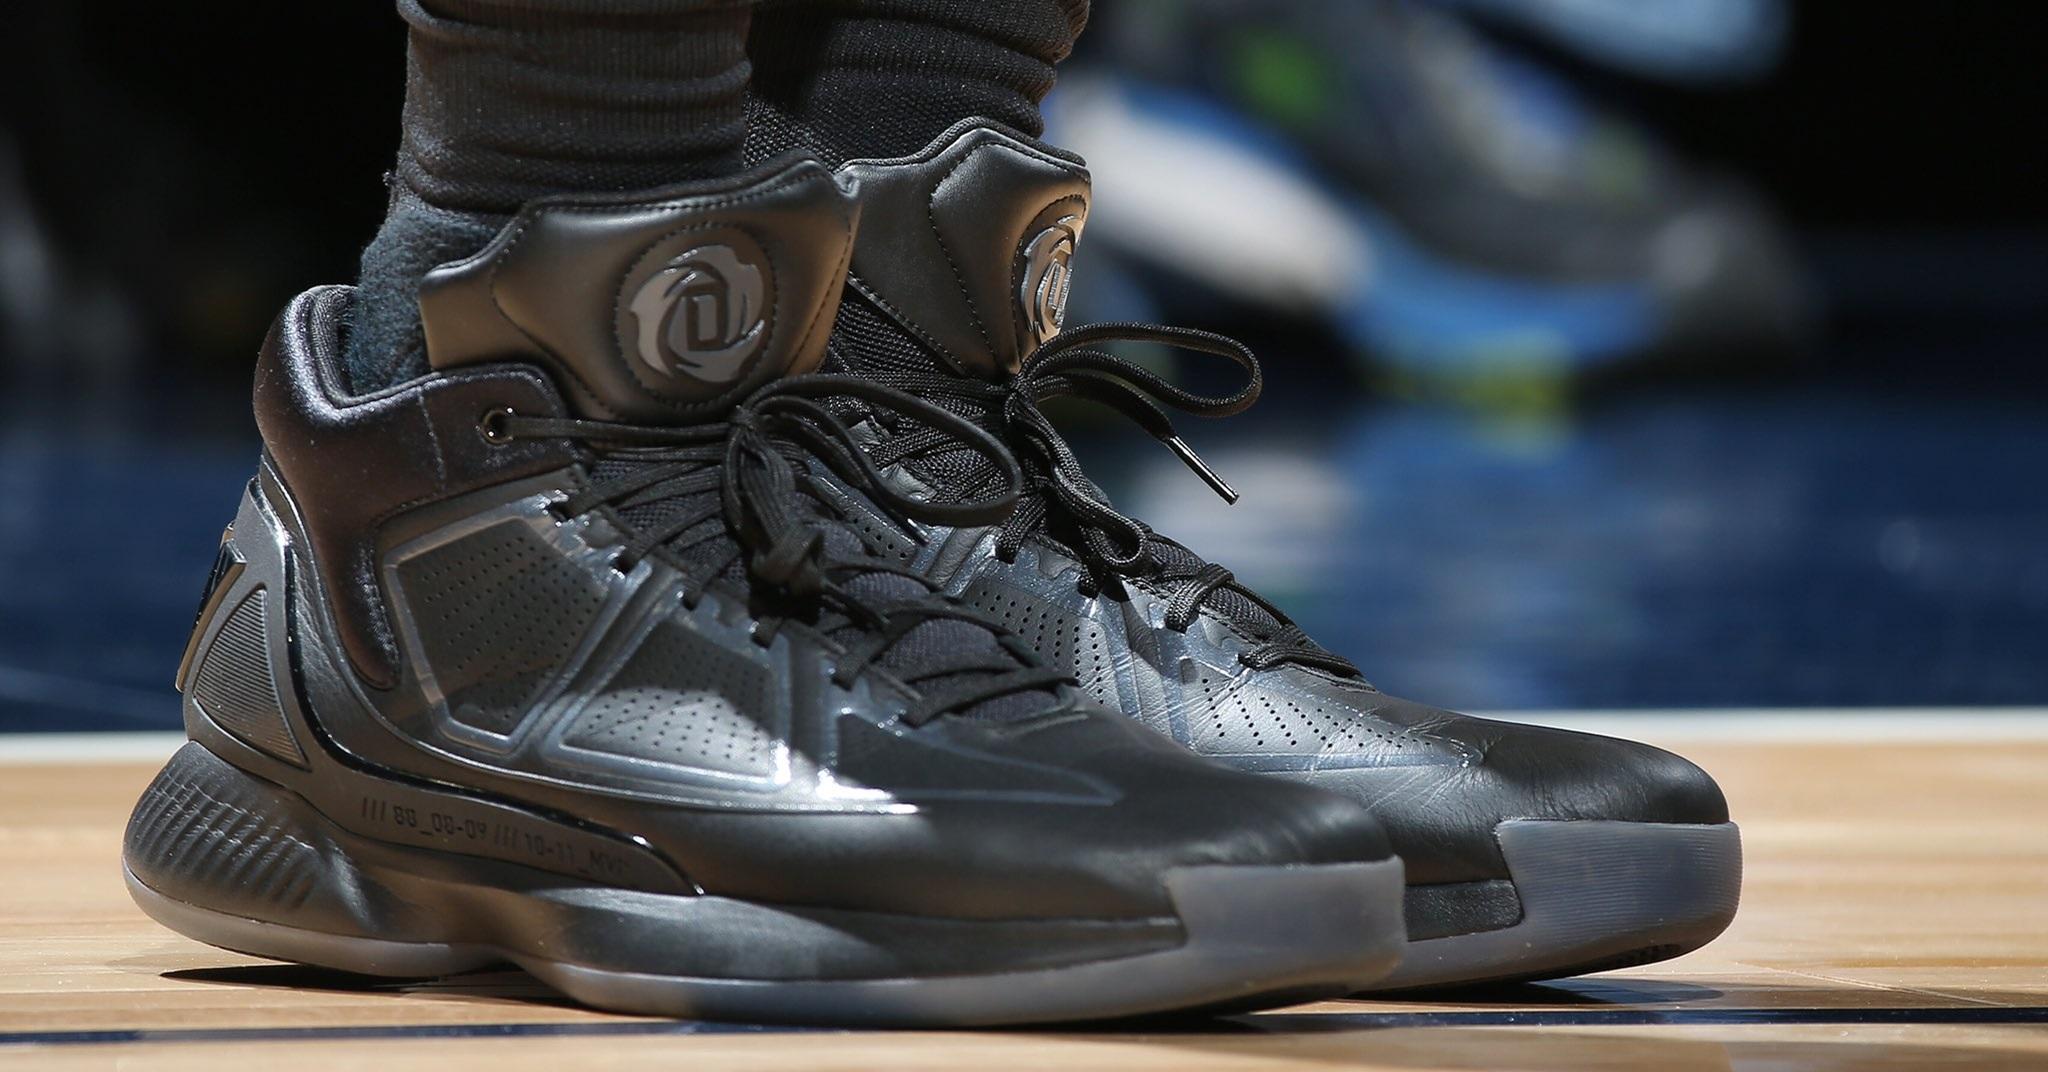 404b30d3b7df 選手實著  第十代戰靴現身Derrick Rose 上腳adidas D Rose 10 – KENLU.net